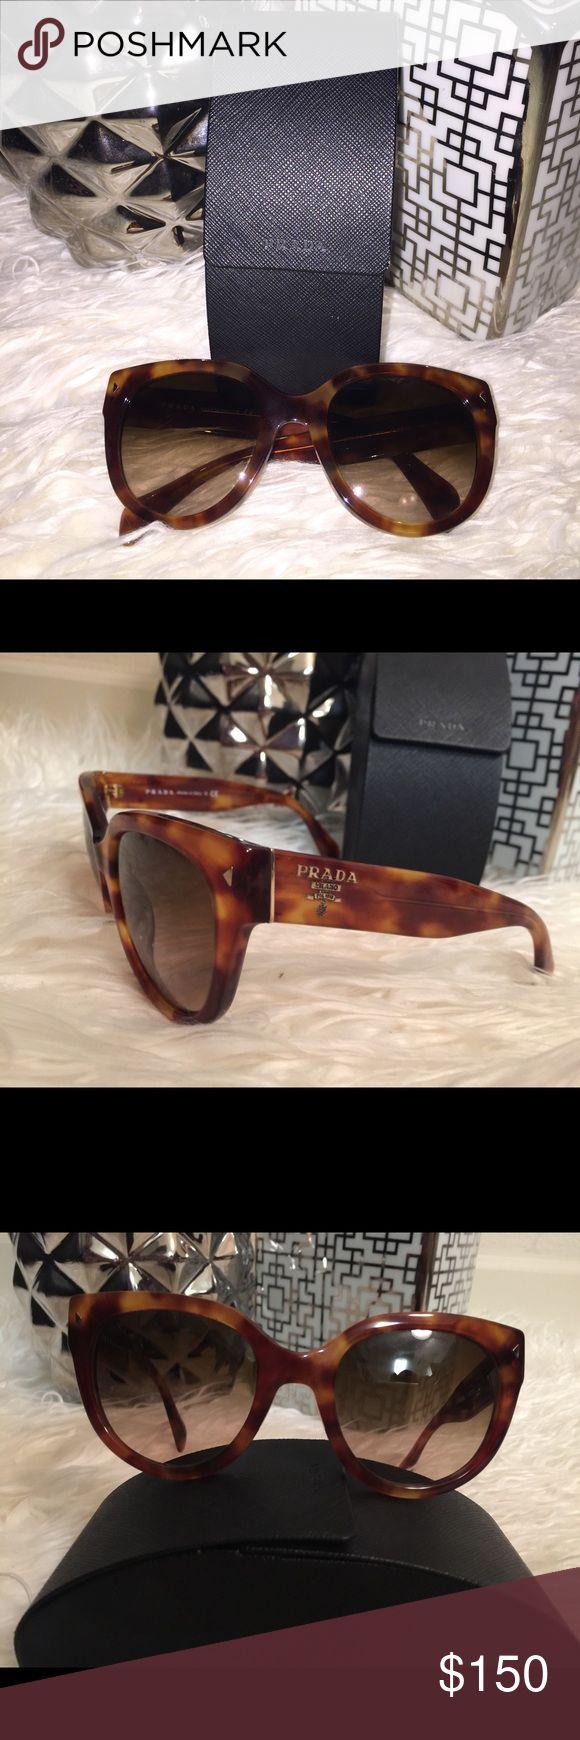 Prada Sunglasses 100% Authentic EXCELLENT condition Prada Sunglasses tortoise color comes with cloth and case Prada Accessories Sunglasses